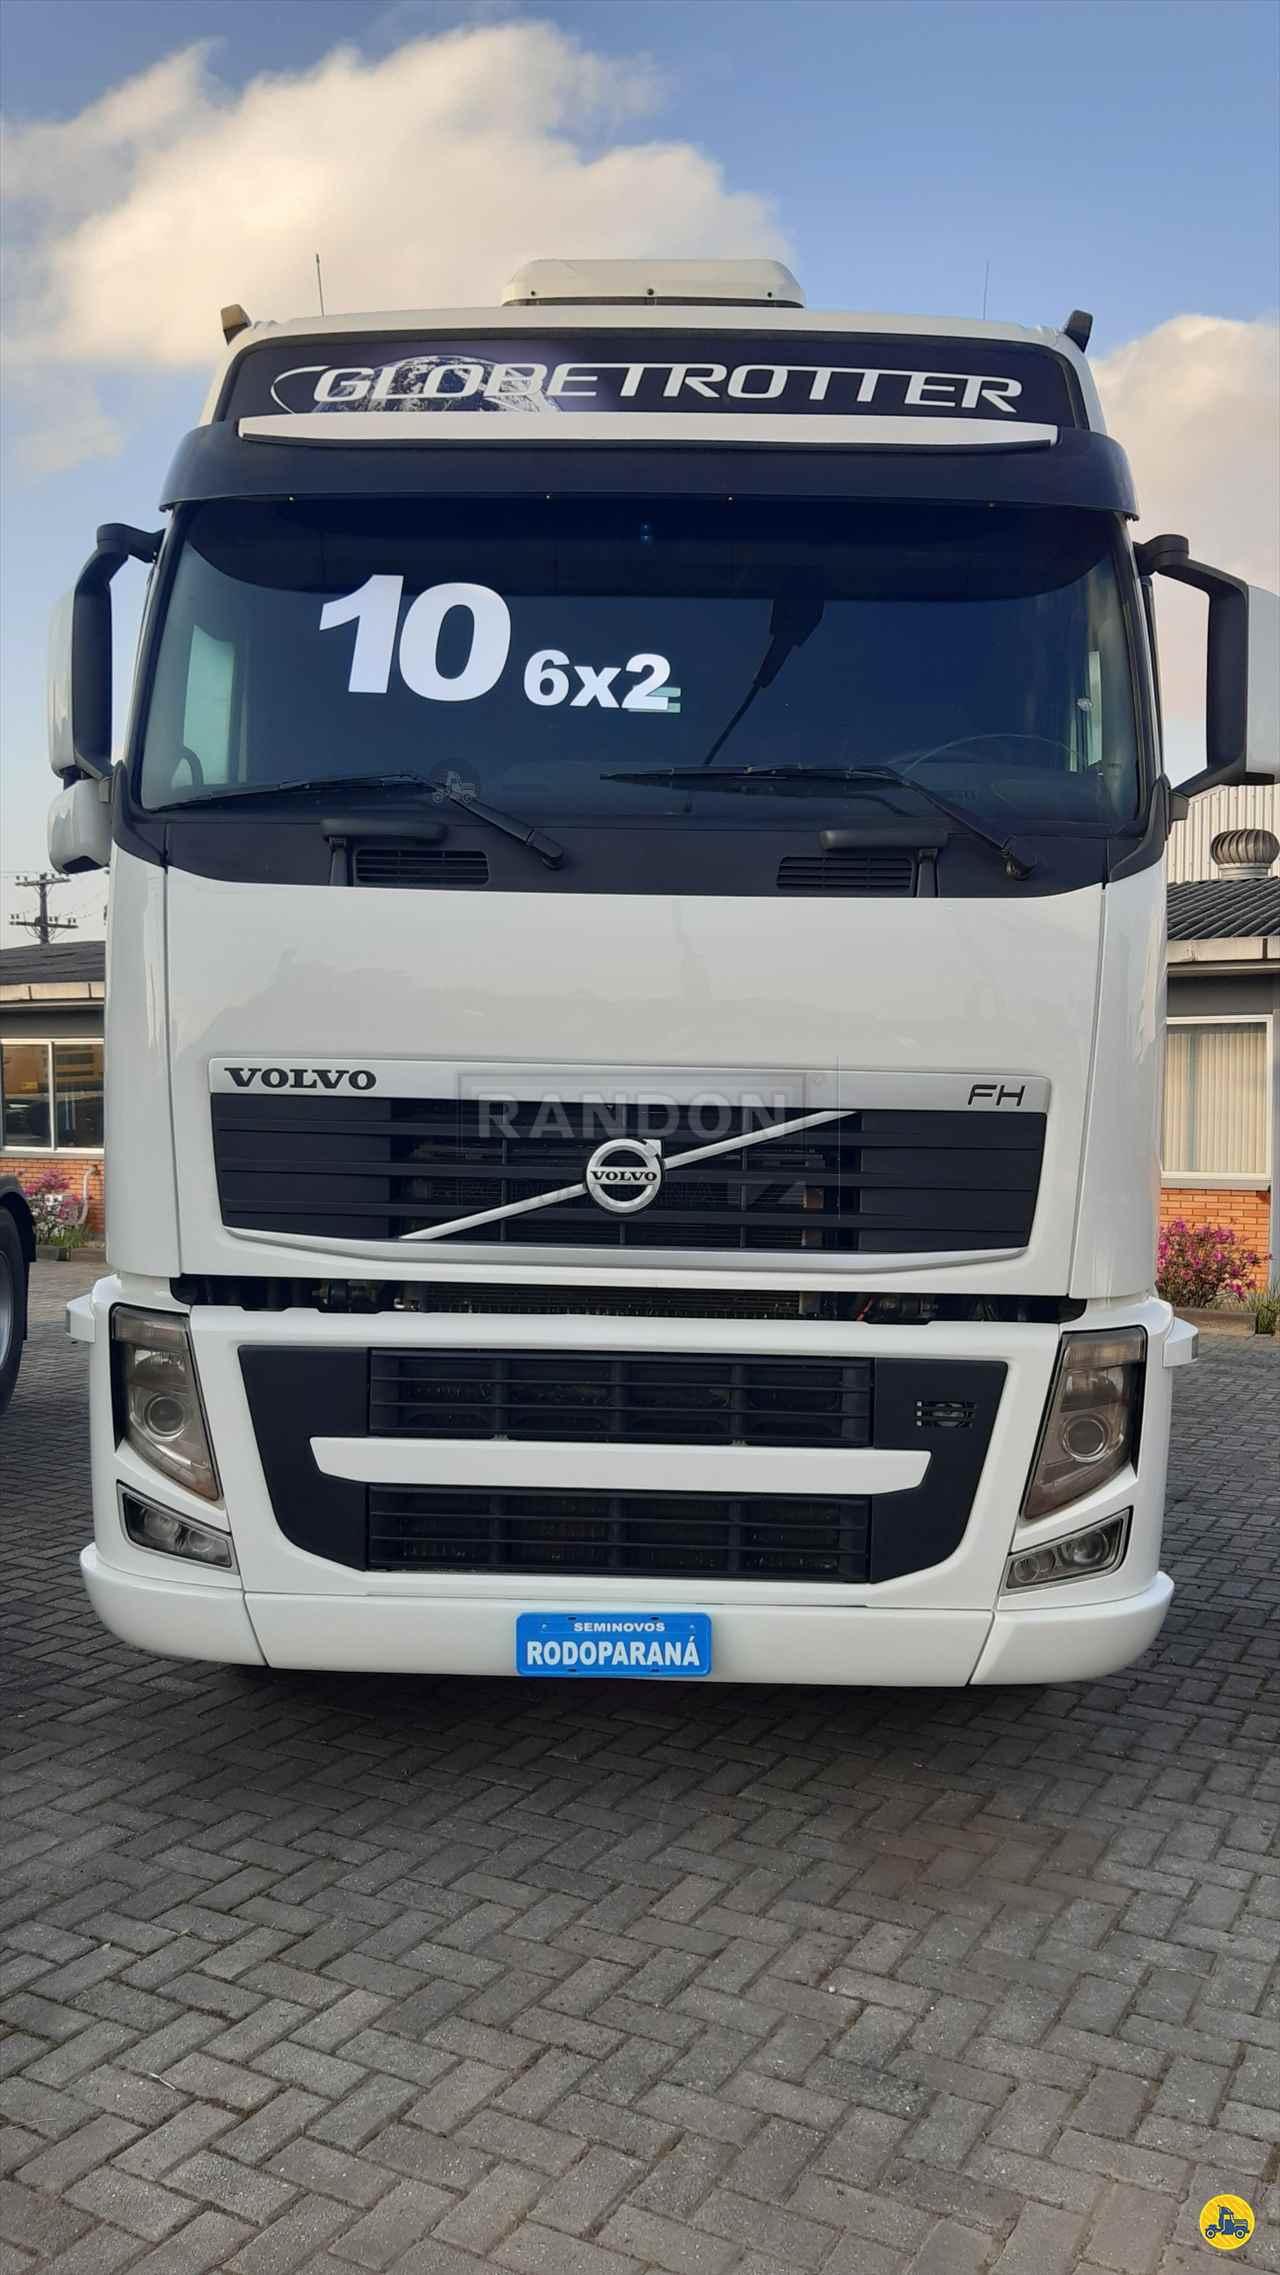 CAMINHAO VOLVO VOLVO FH 440 Cavalo Mecânico Truck 6x2 Rodoparana - RANDON Curitiba CURITIBA PARANÁ PR